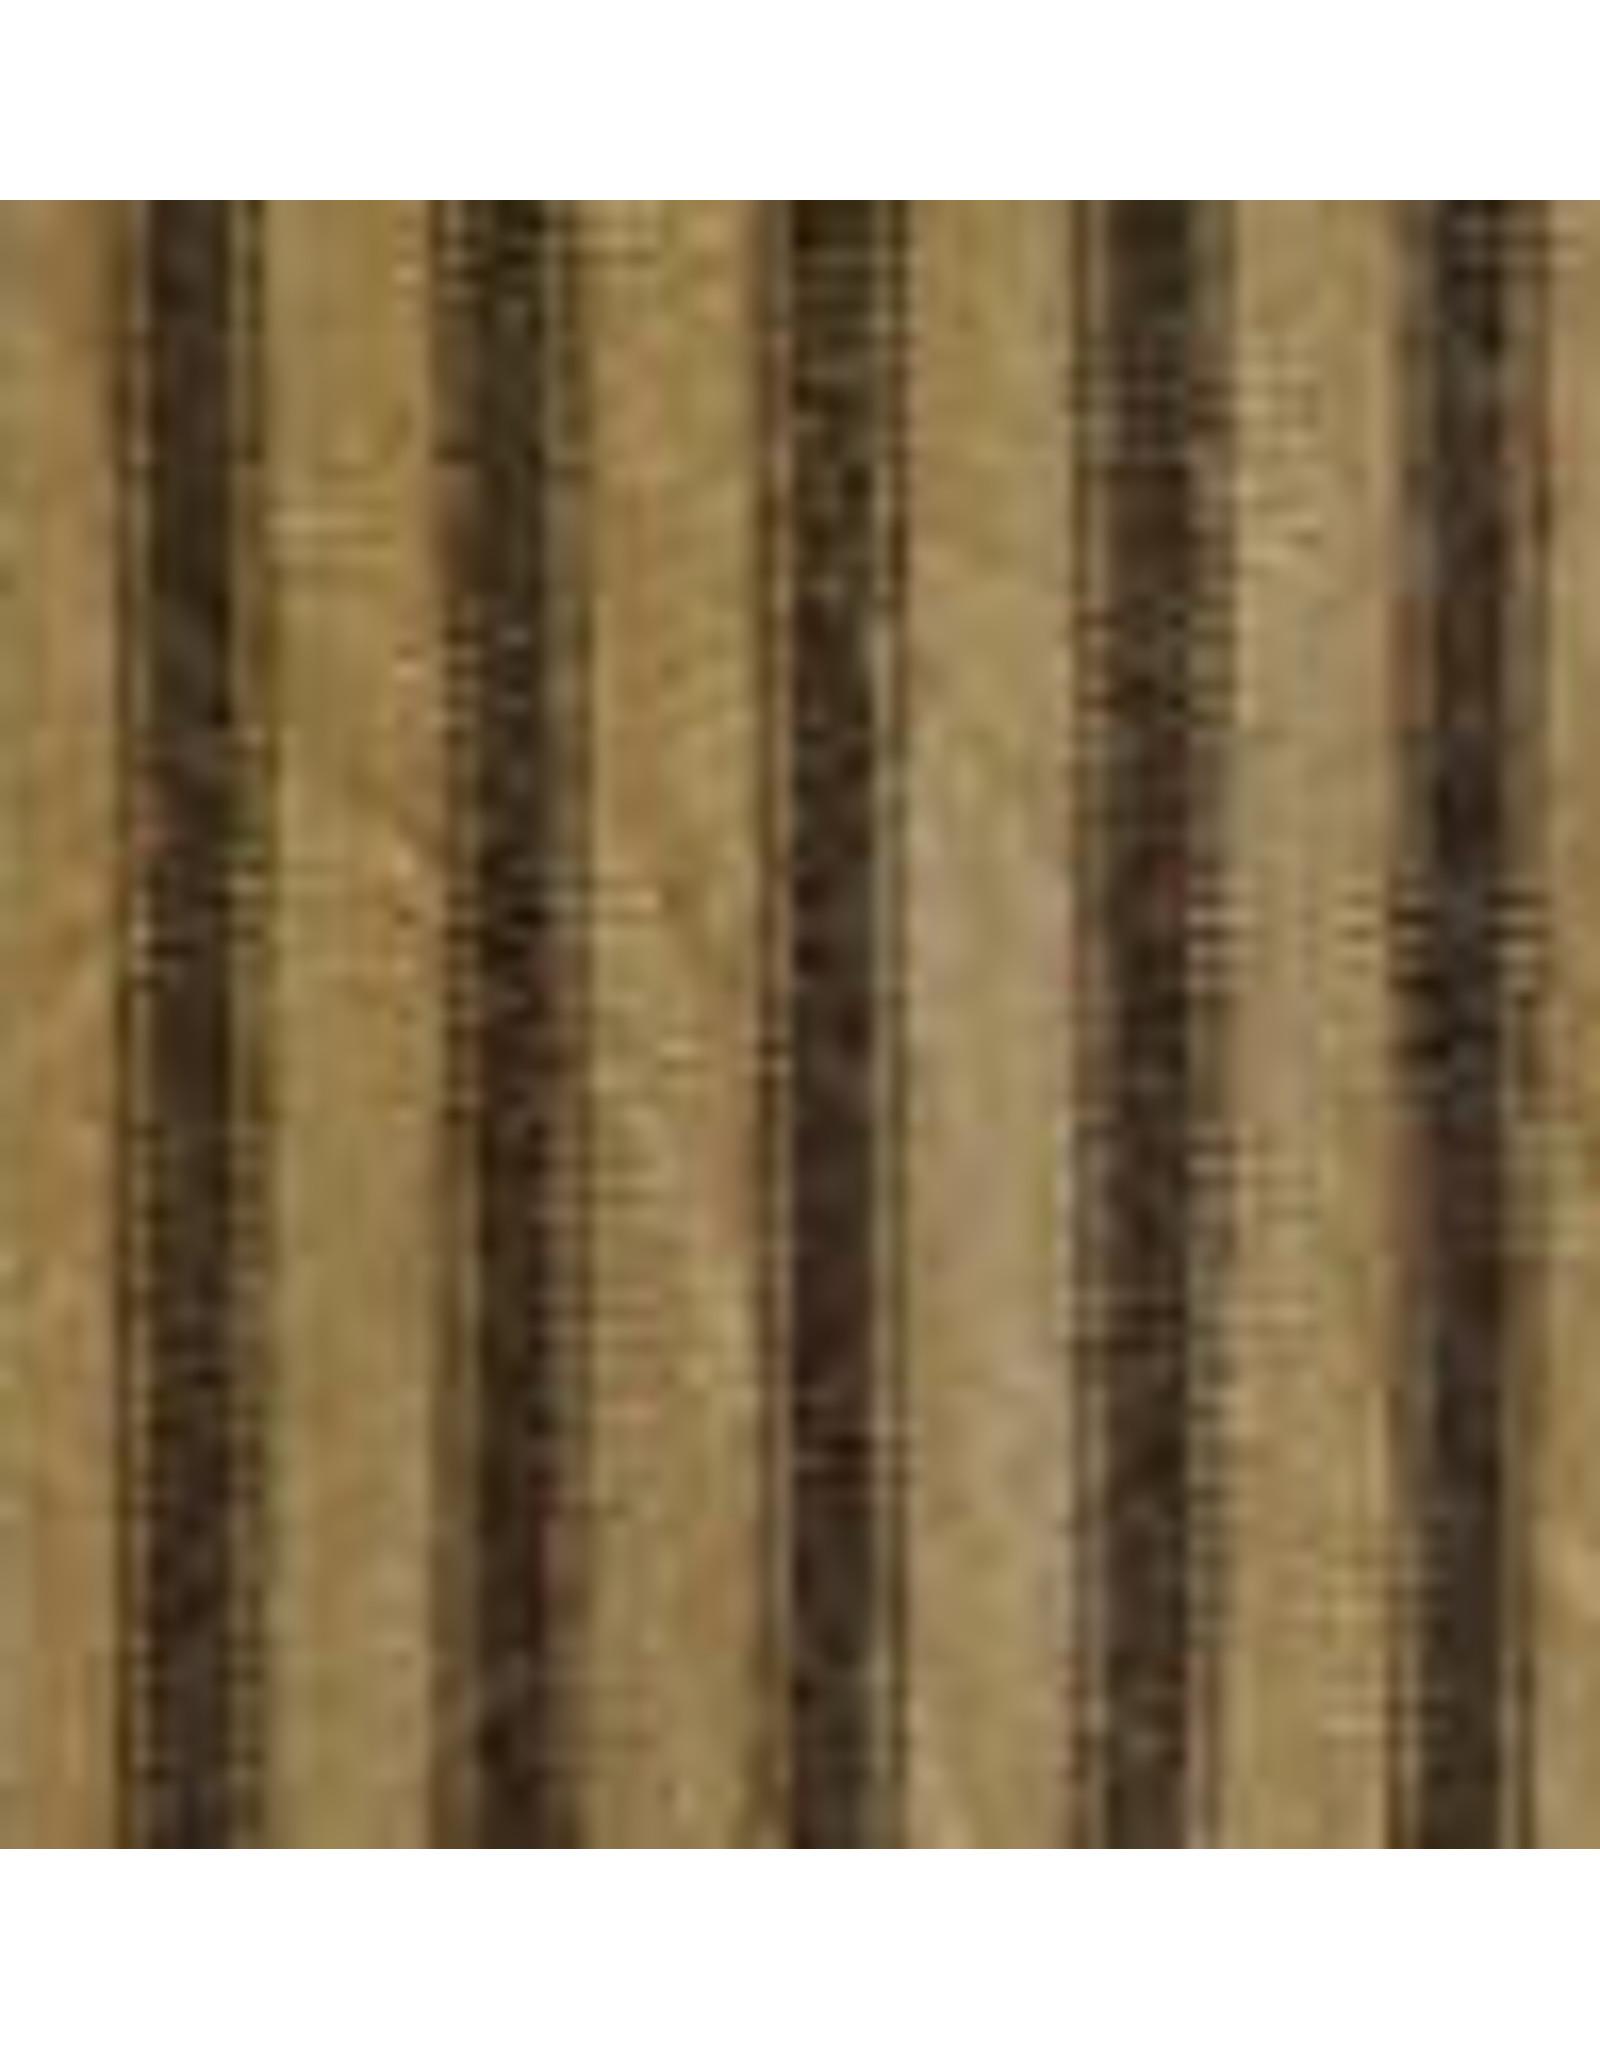 Yd. Black and Tan Ticking Stripe Fabric #56